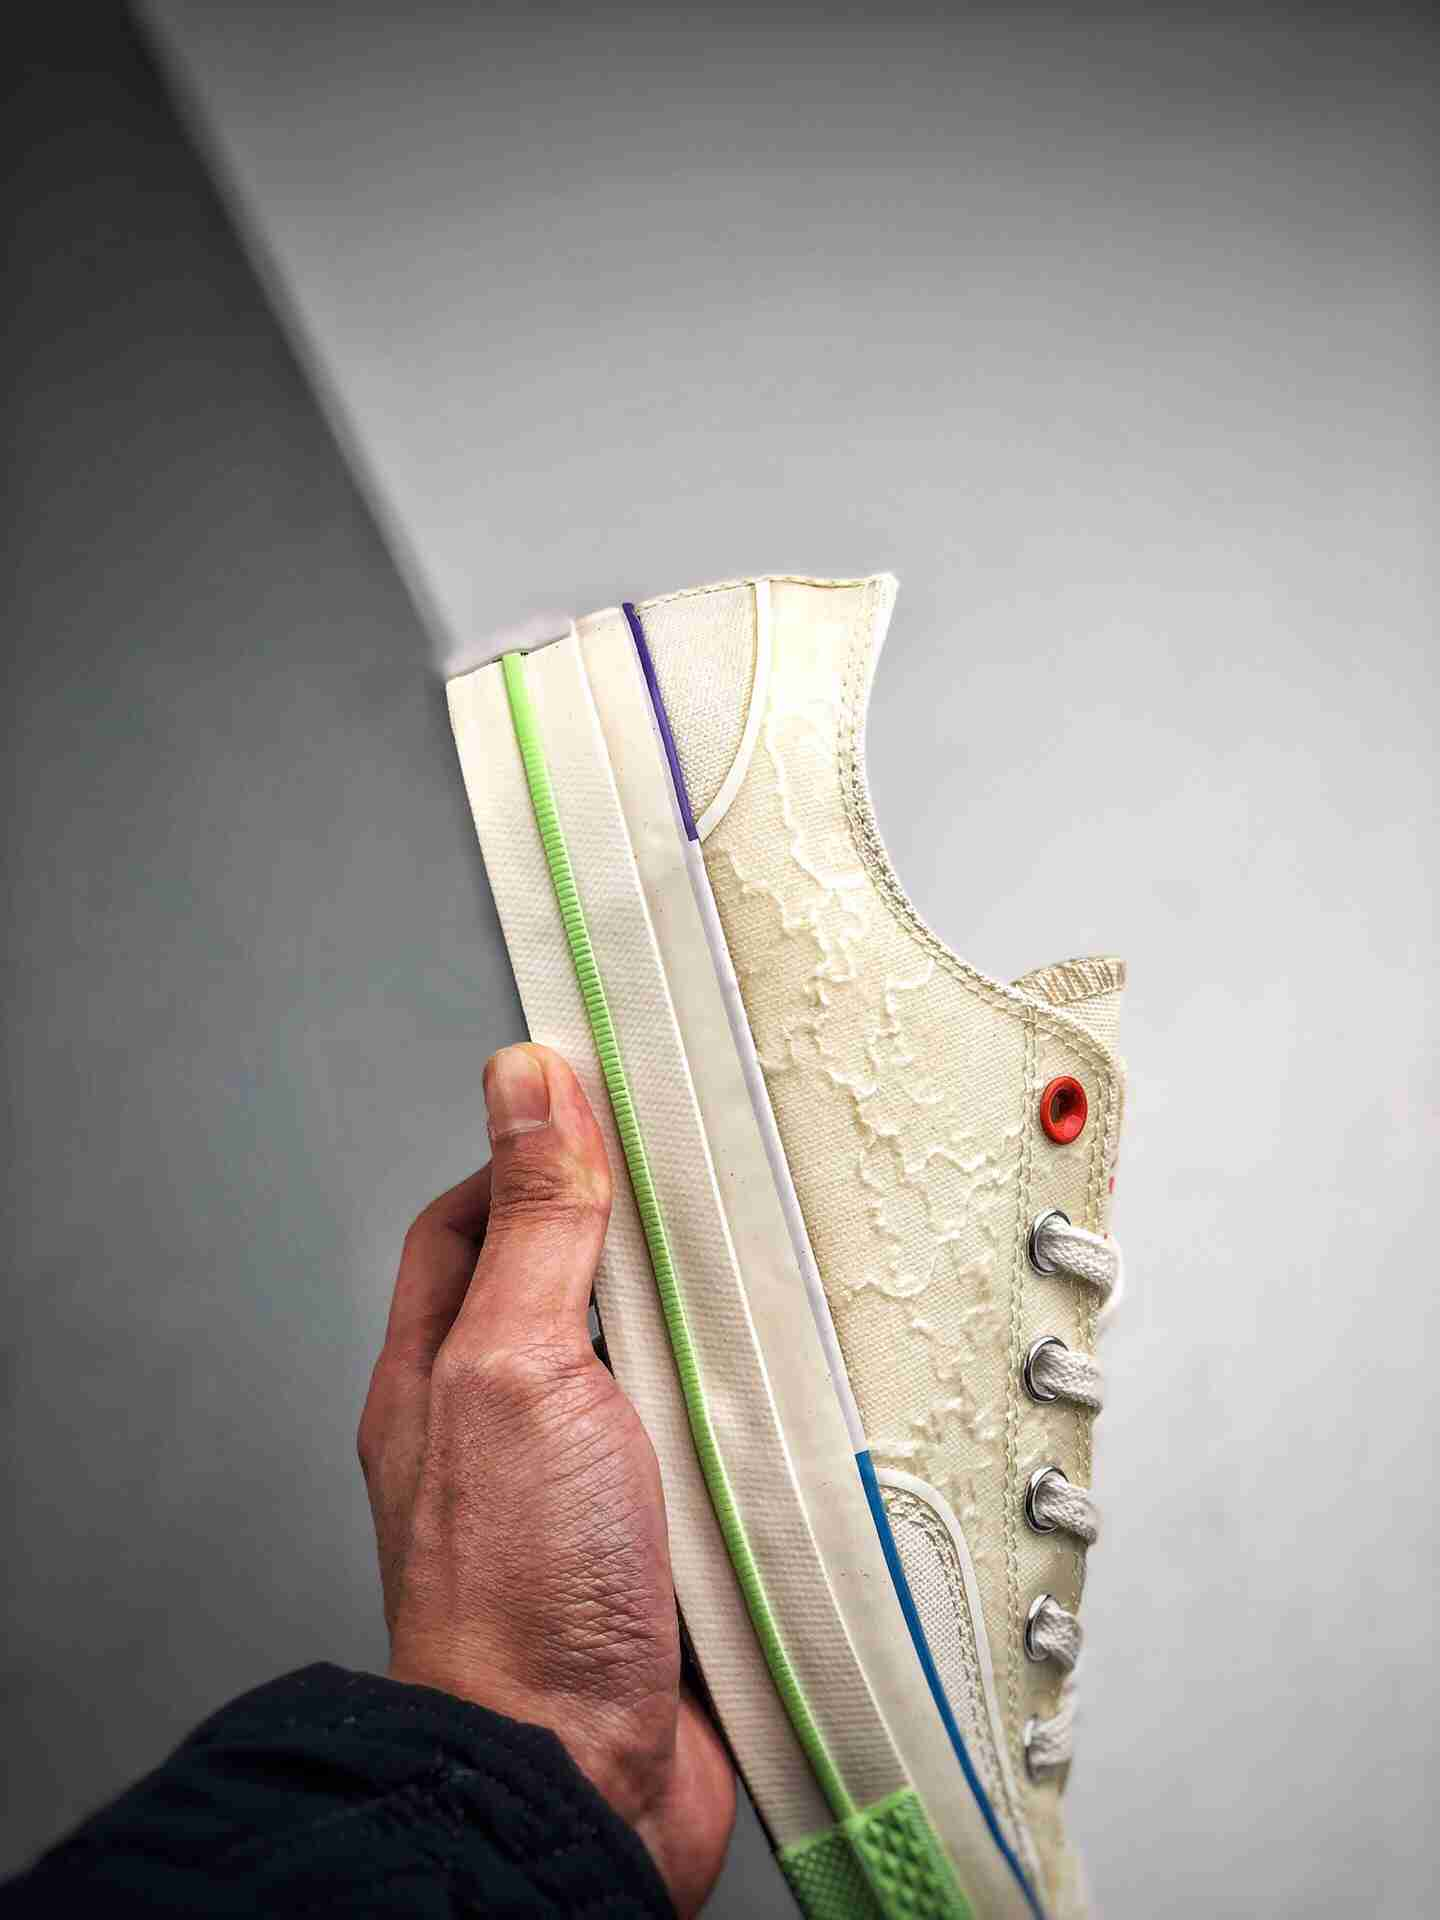 Convers 1970s x Pigalle匡威限量联名 低帮走秀滑板鞋